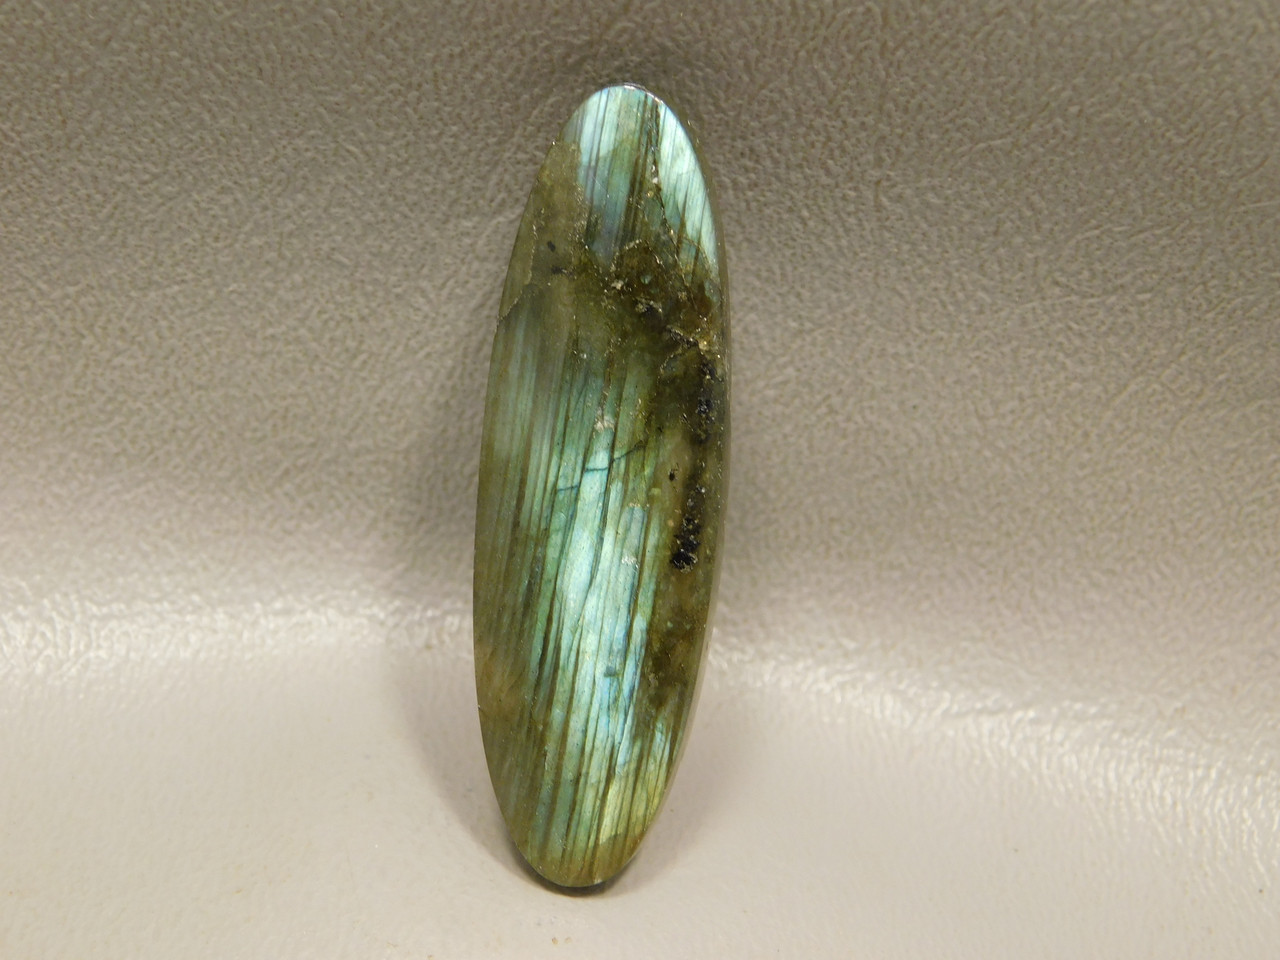 Rainbow Labradorite Cabochon Gemstone Designer Stone #3